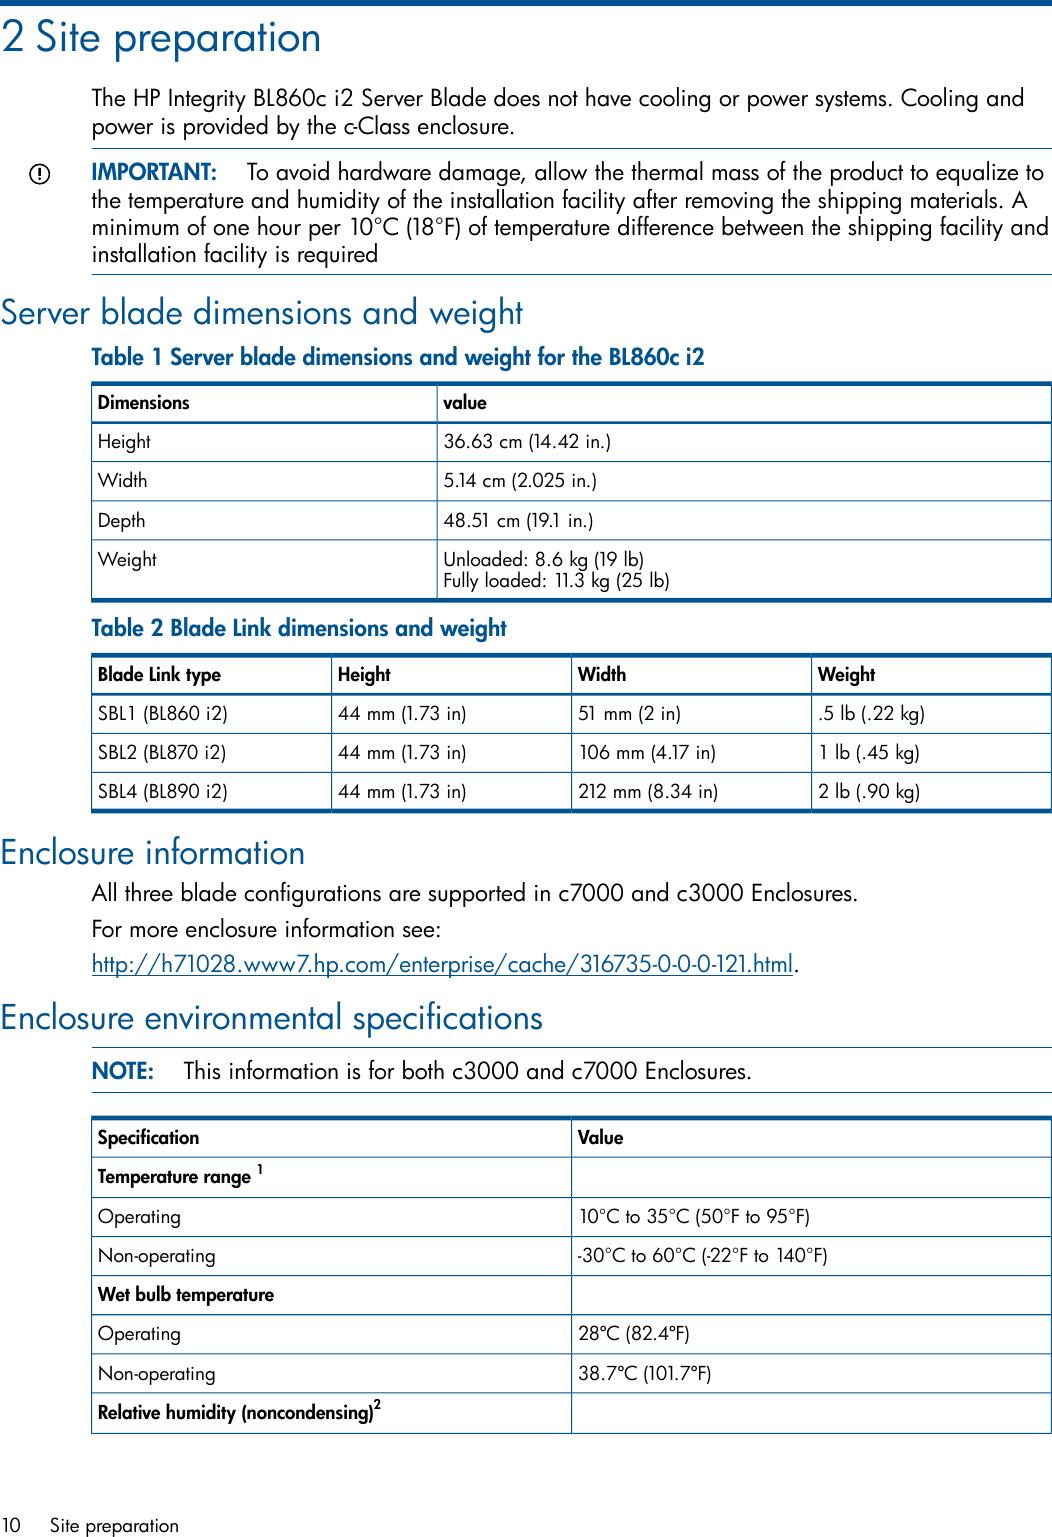 Hp Server Bl860C I2 Users Manual Integrity I2, BL870c